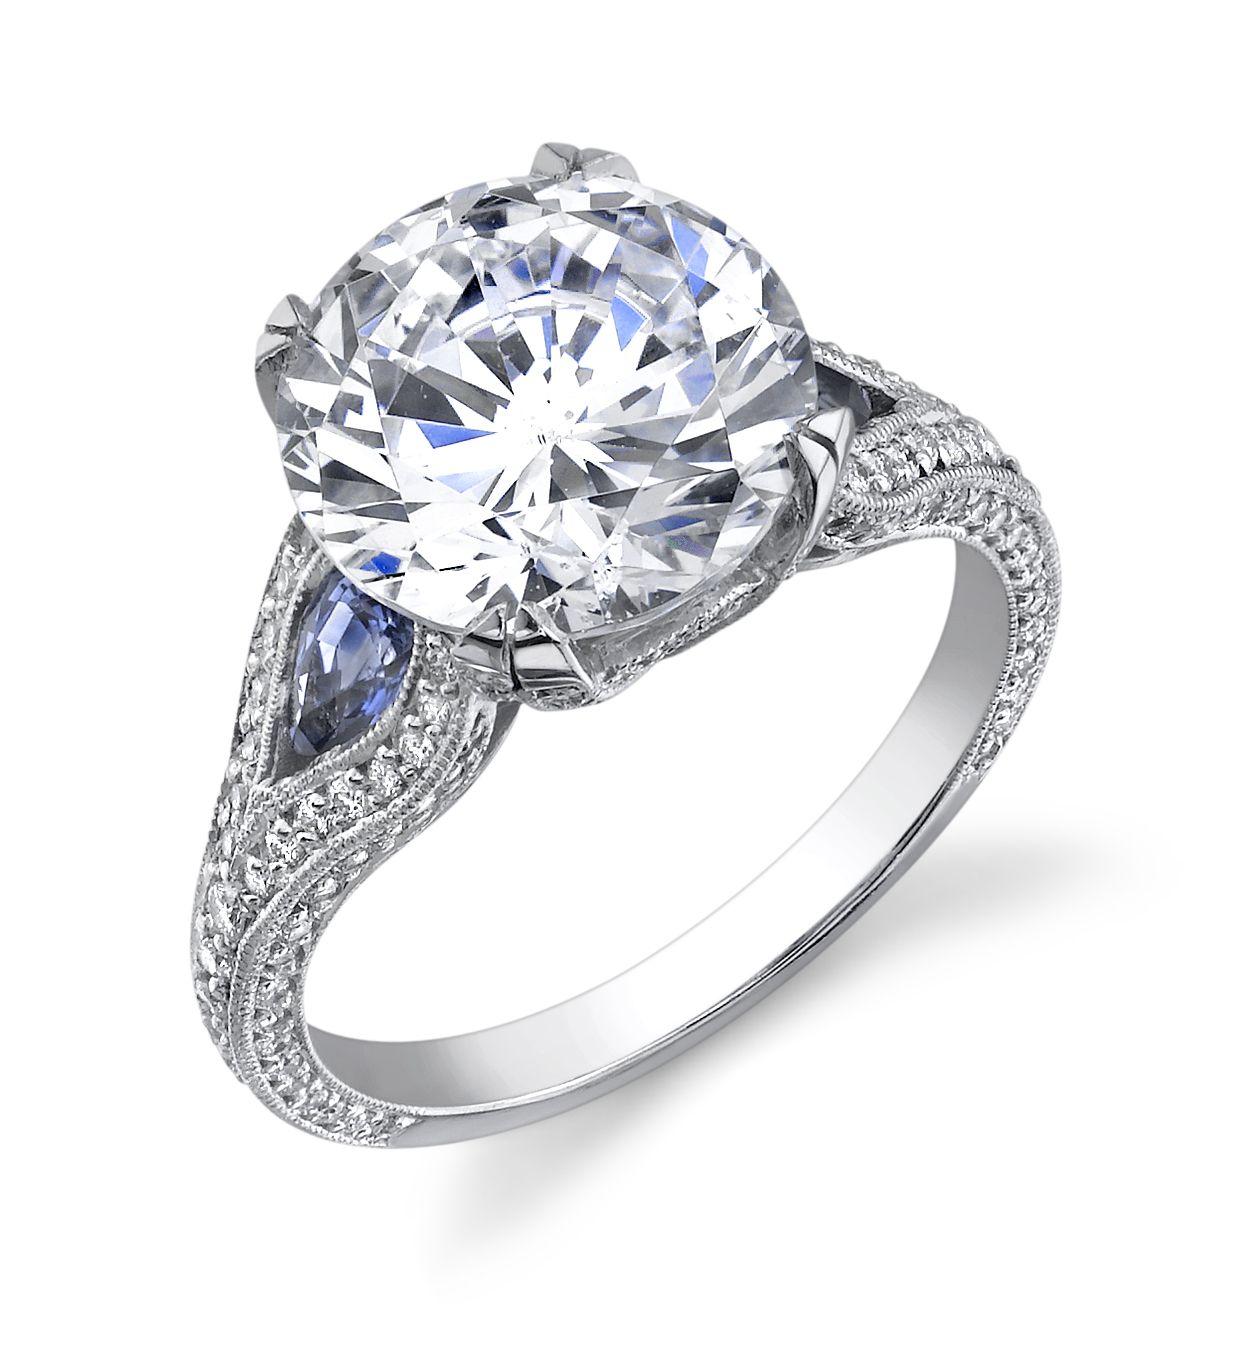 C Gonshor sapphire & diamond ring Sapphire diamond